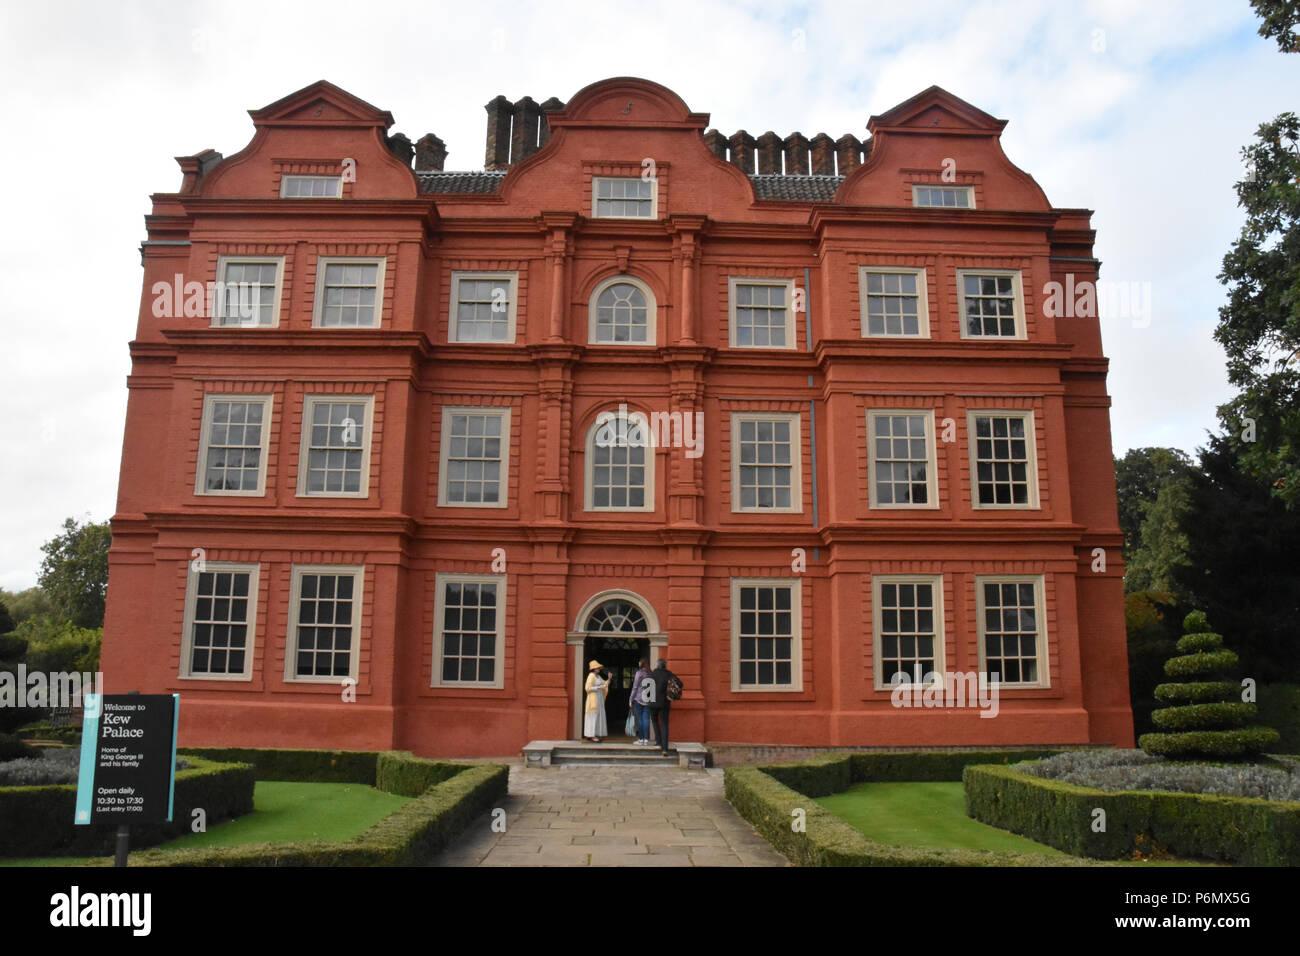 Dutch Royal House Stock Photos & Dutch Royal House Stock Images - Alamy